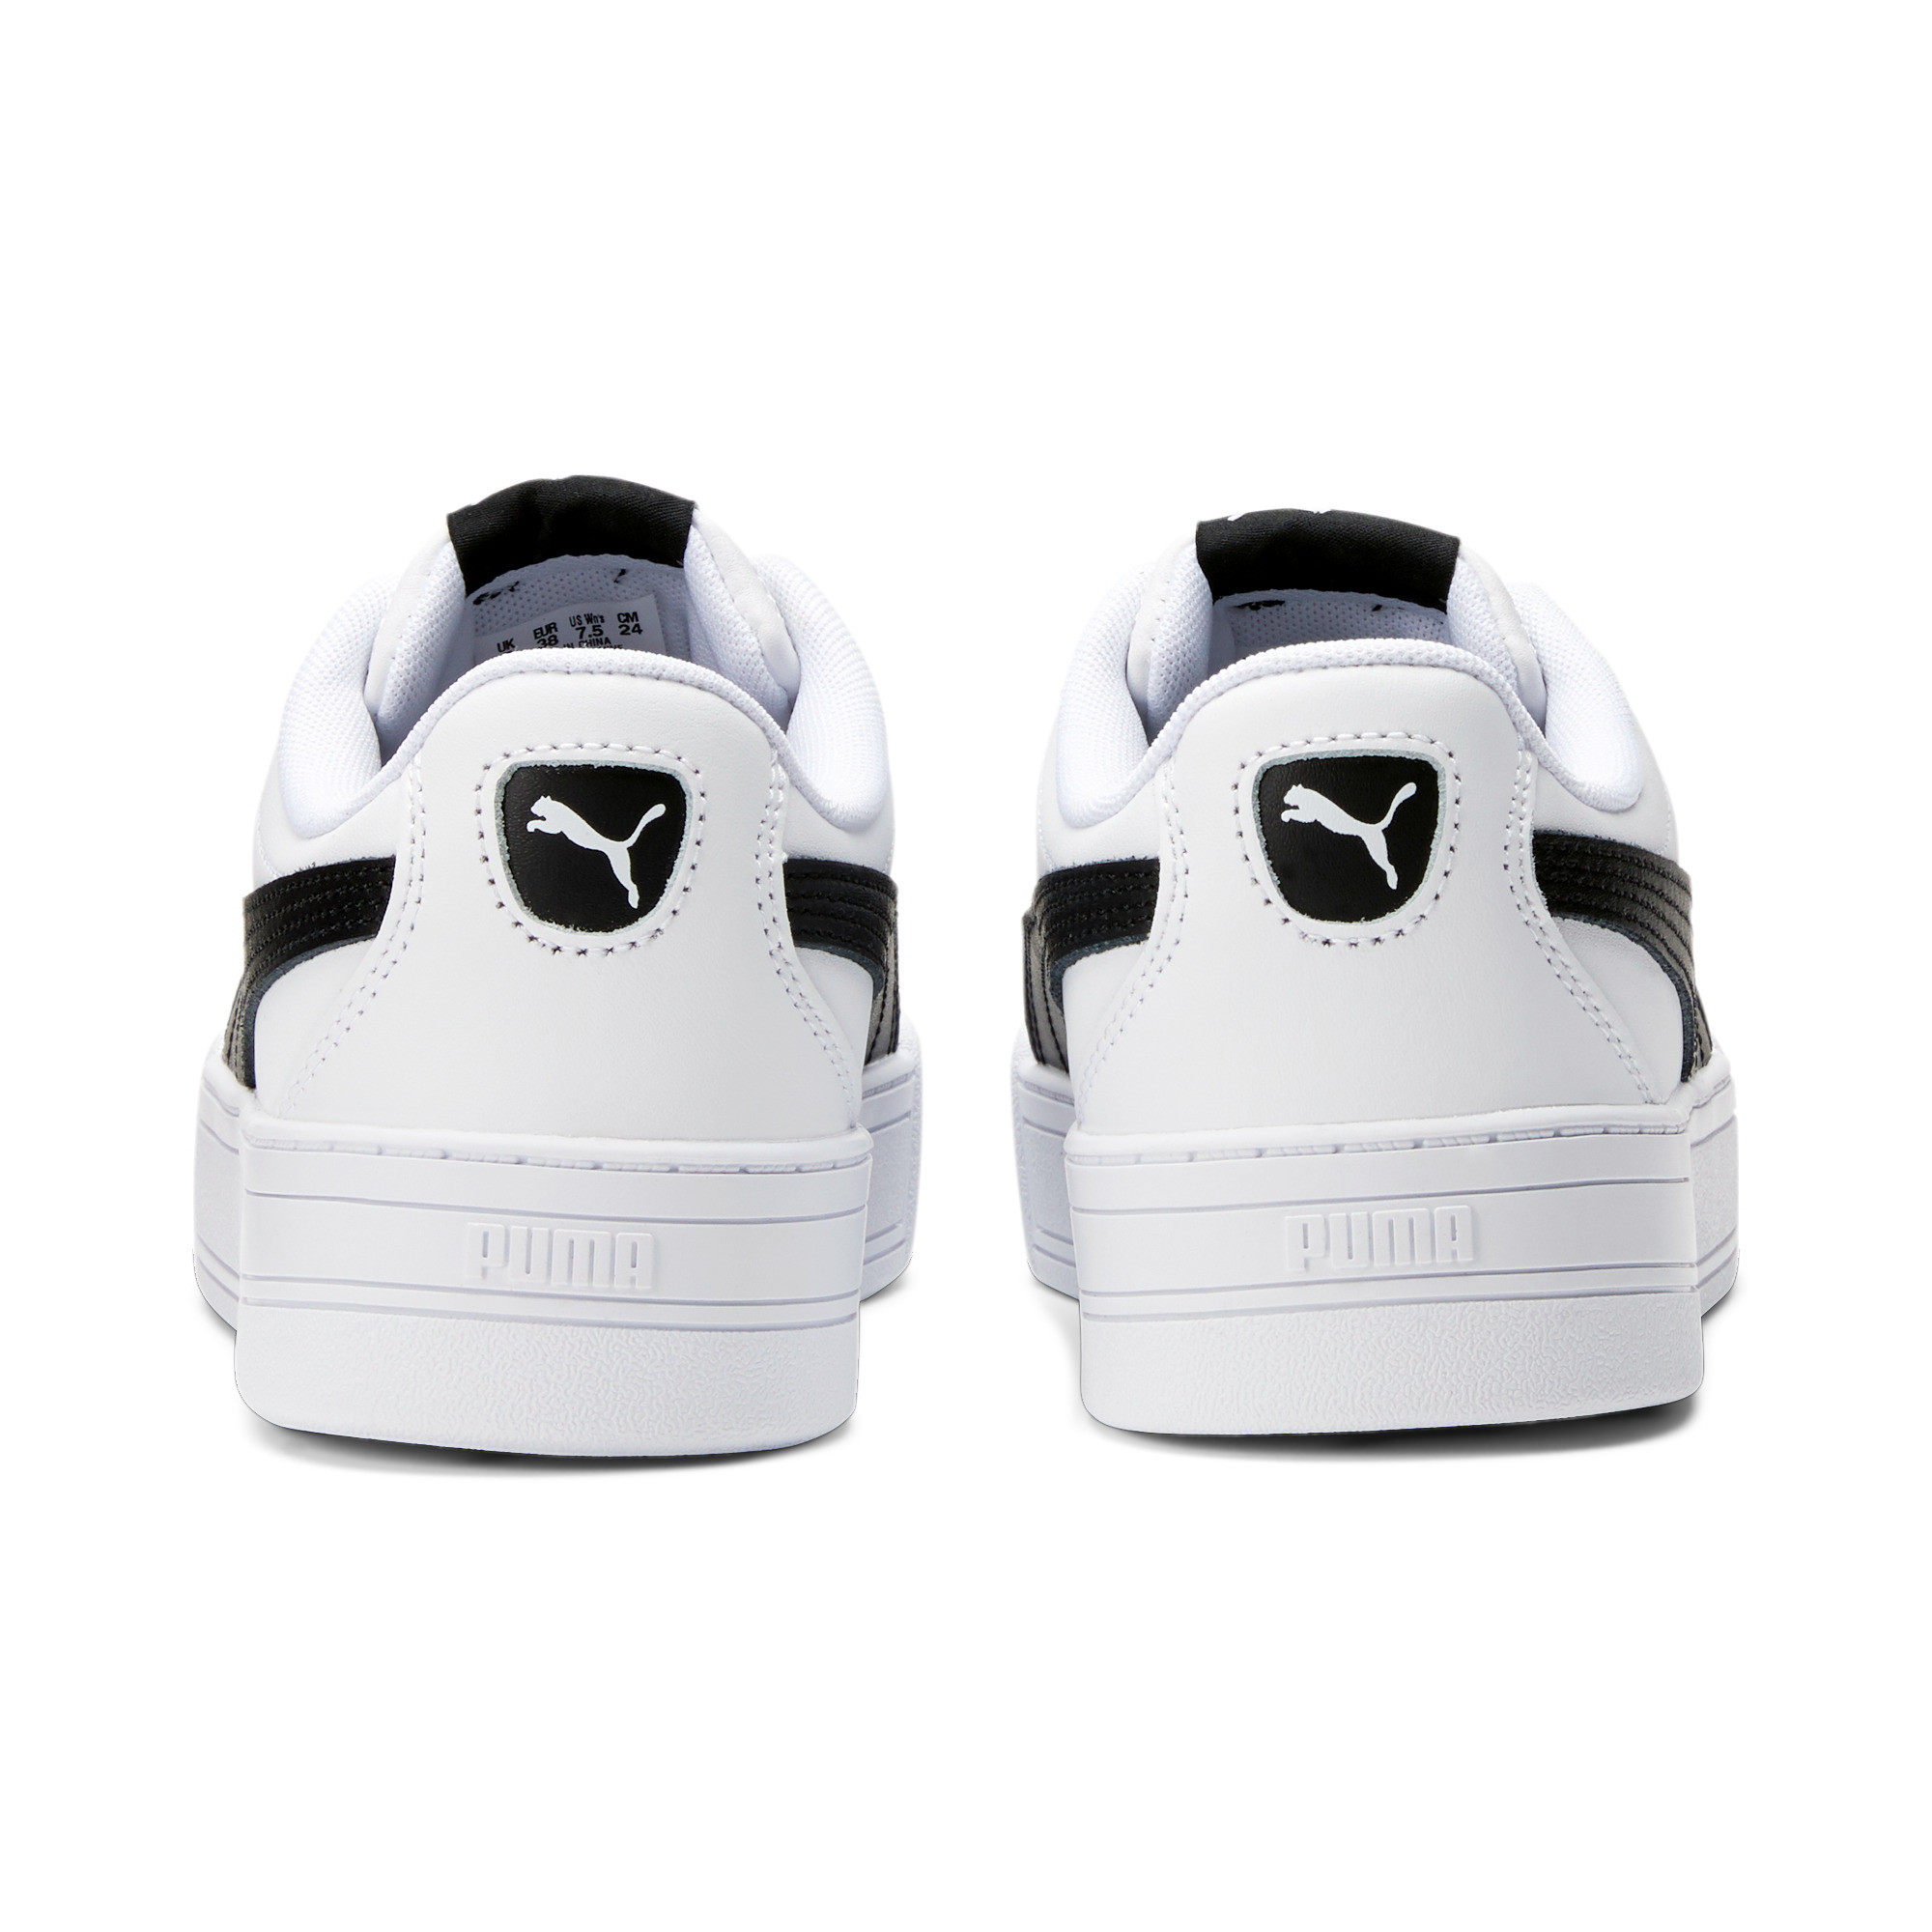 PUMA-Women-039-s-Skye-Sneakers thumbnail 3